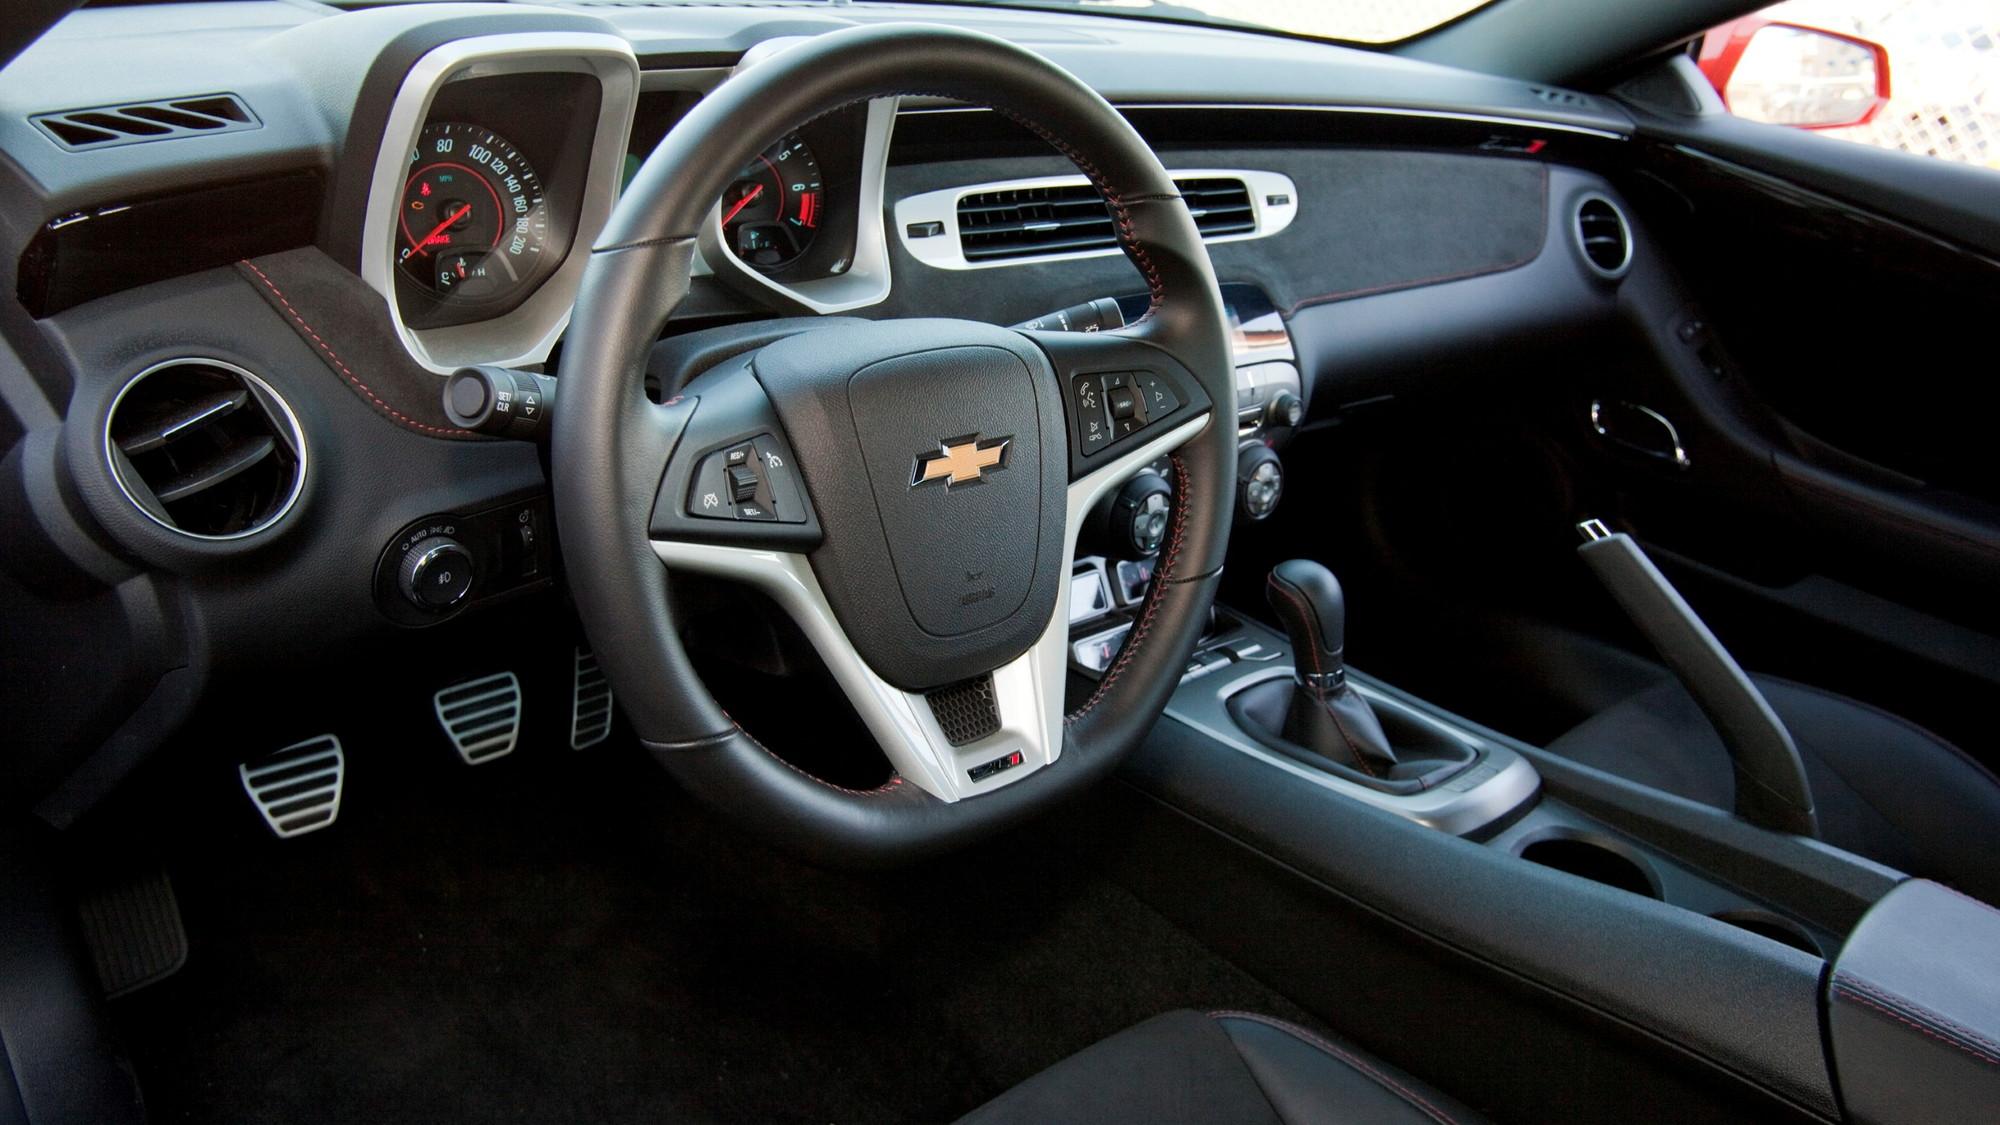 2012 Chevrolet Camaro ZL1 first drive